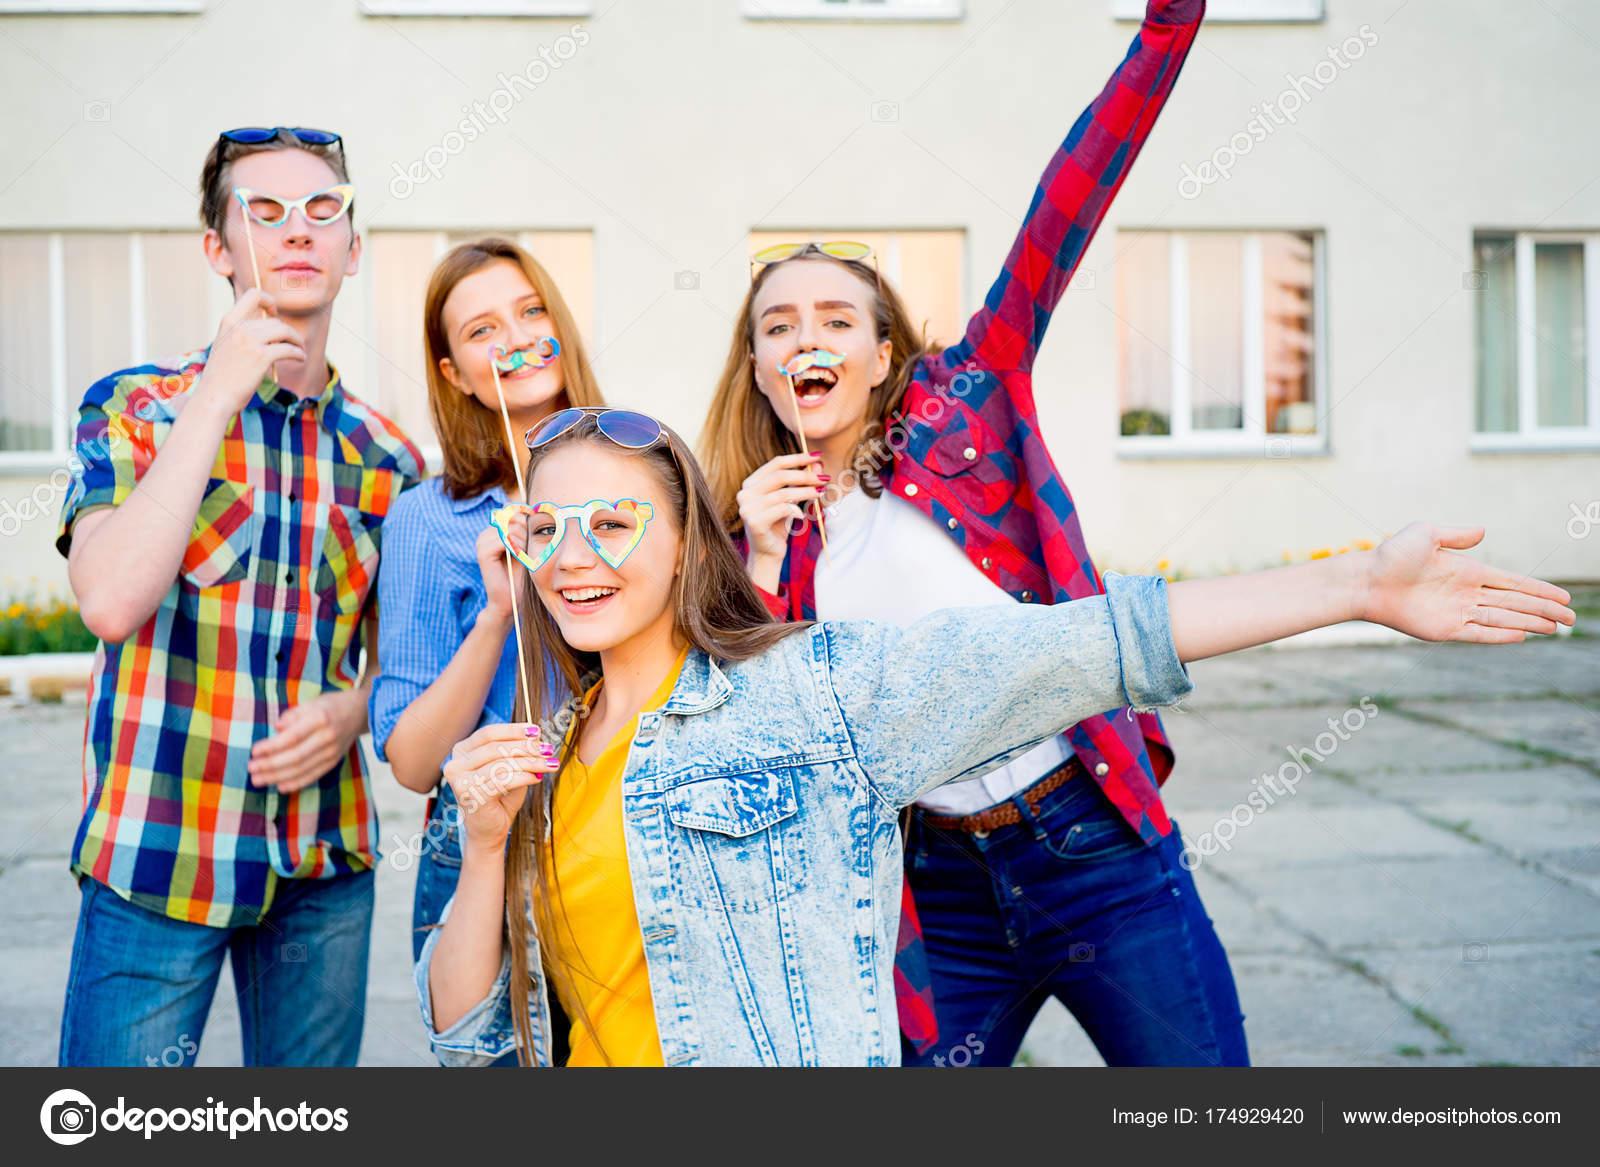 Jugendliche mit einer party — Stockfoto © Lenanichizhenova #174929420